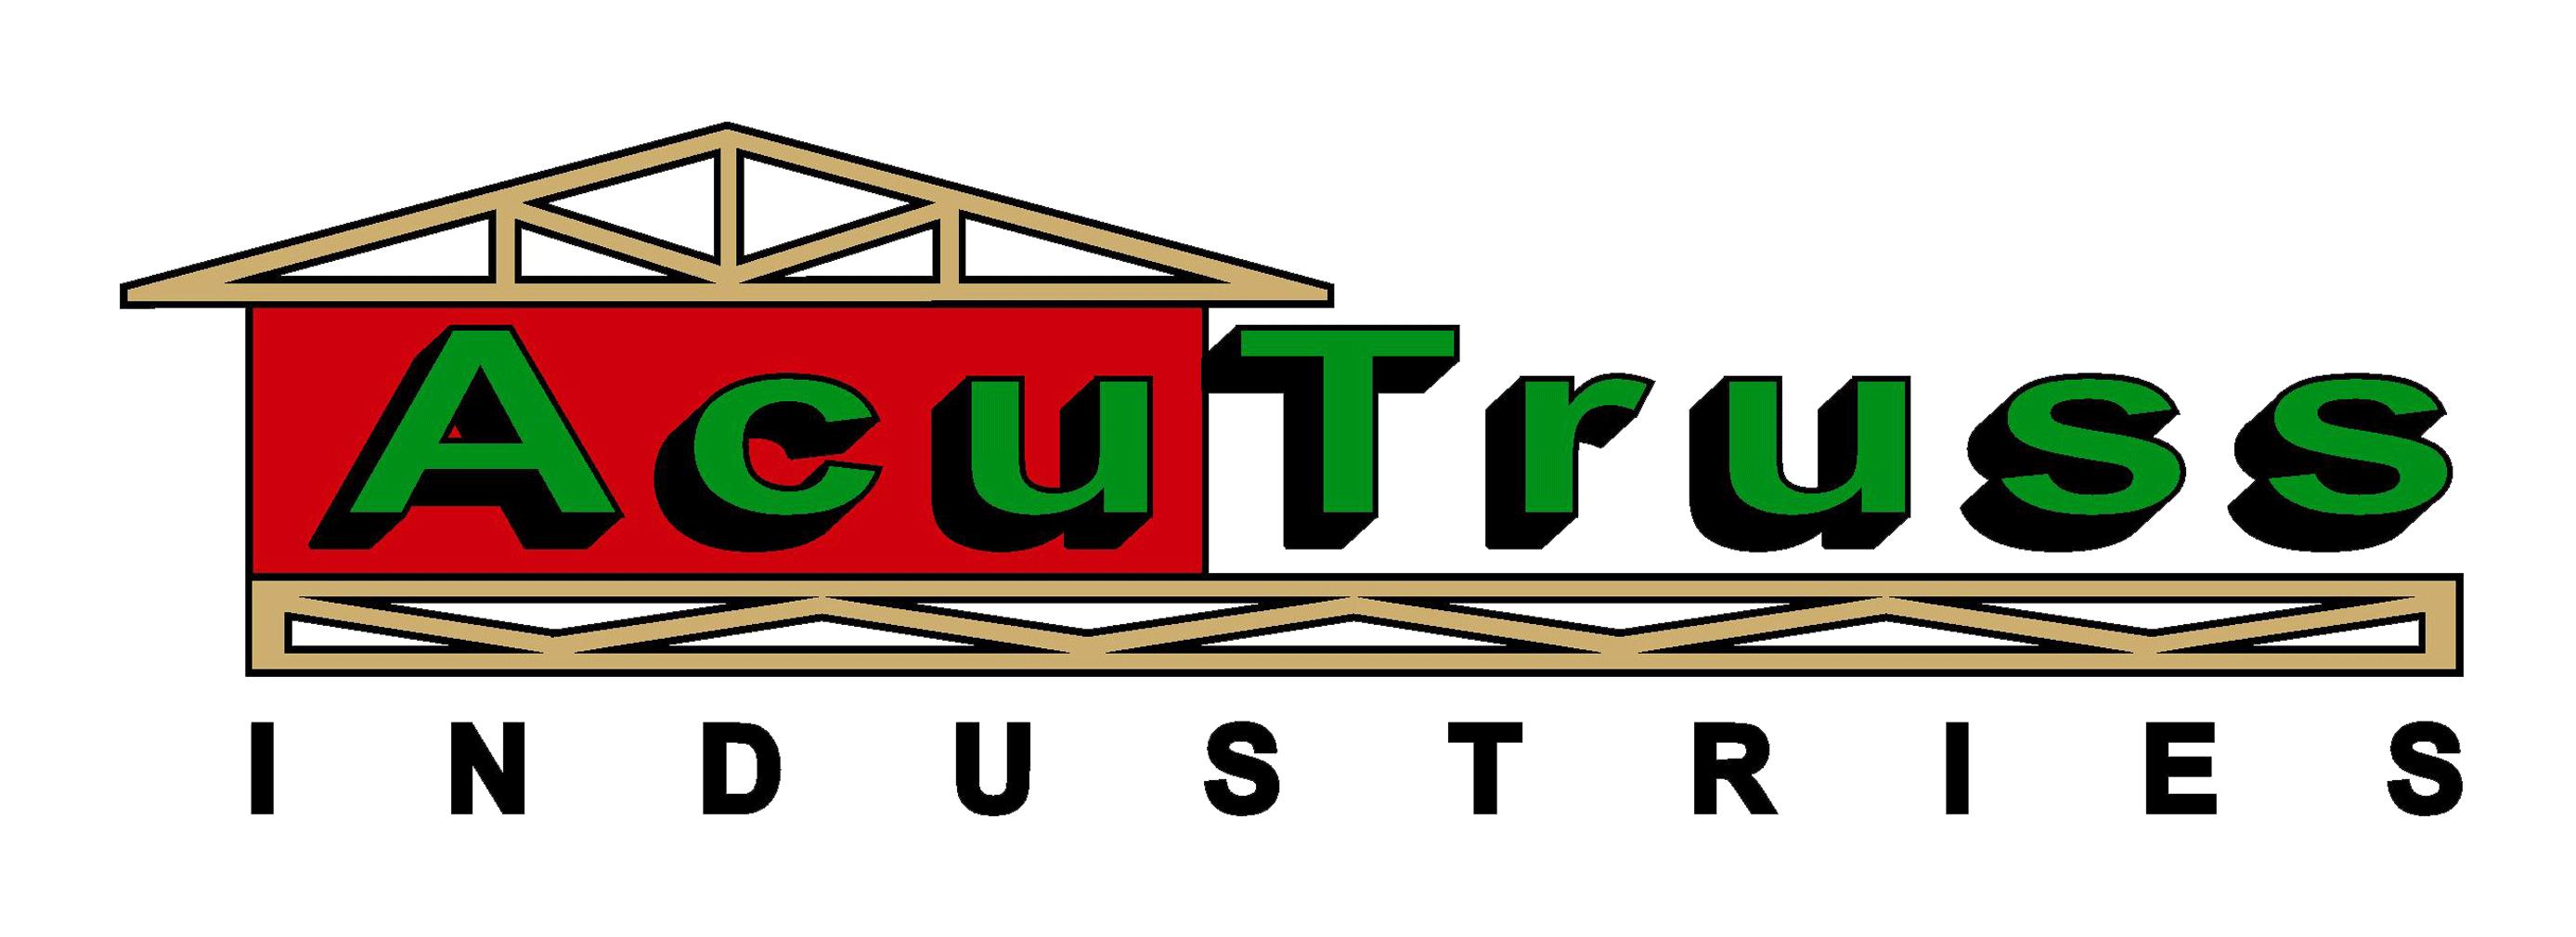 acutruss_logo_web